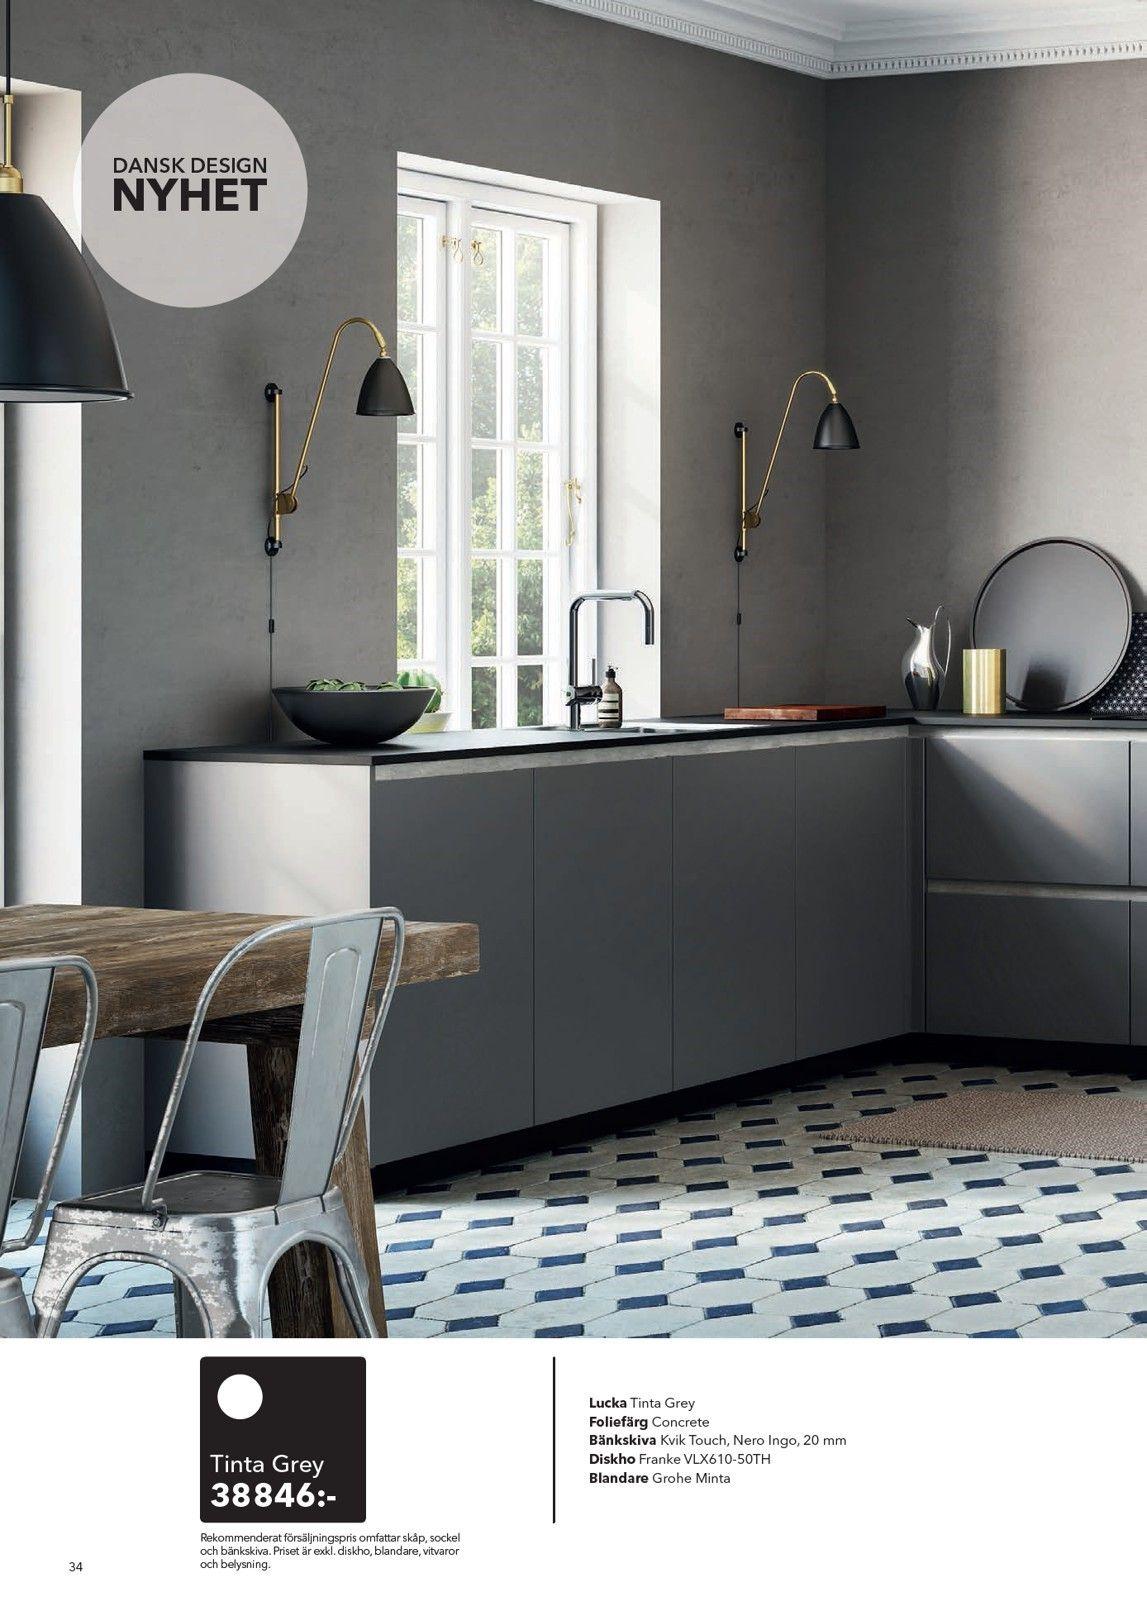 ab3ace38421 Kvik - Katalog 2016 | Kitchen | Kitchen, Home decor, Dining bench